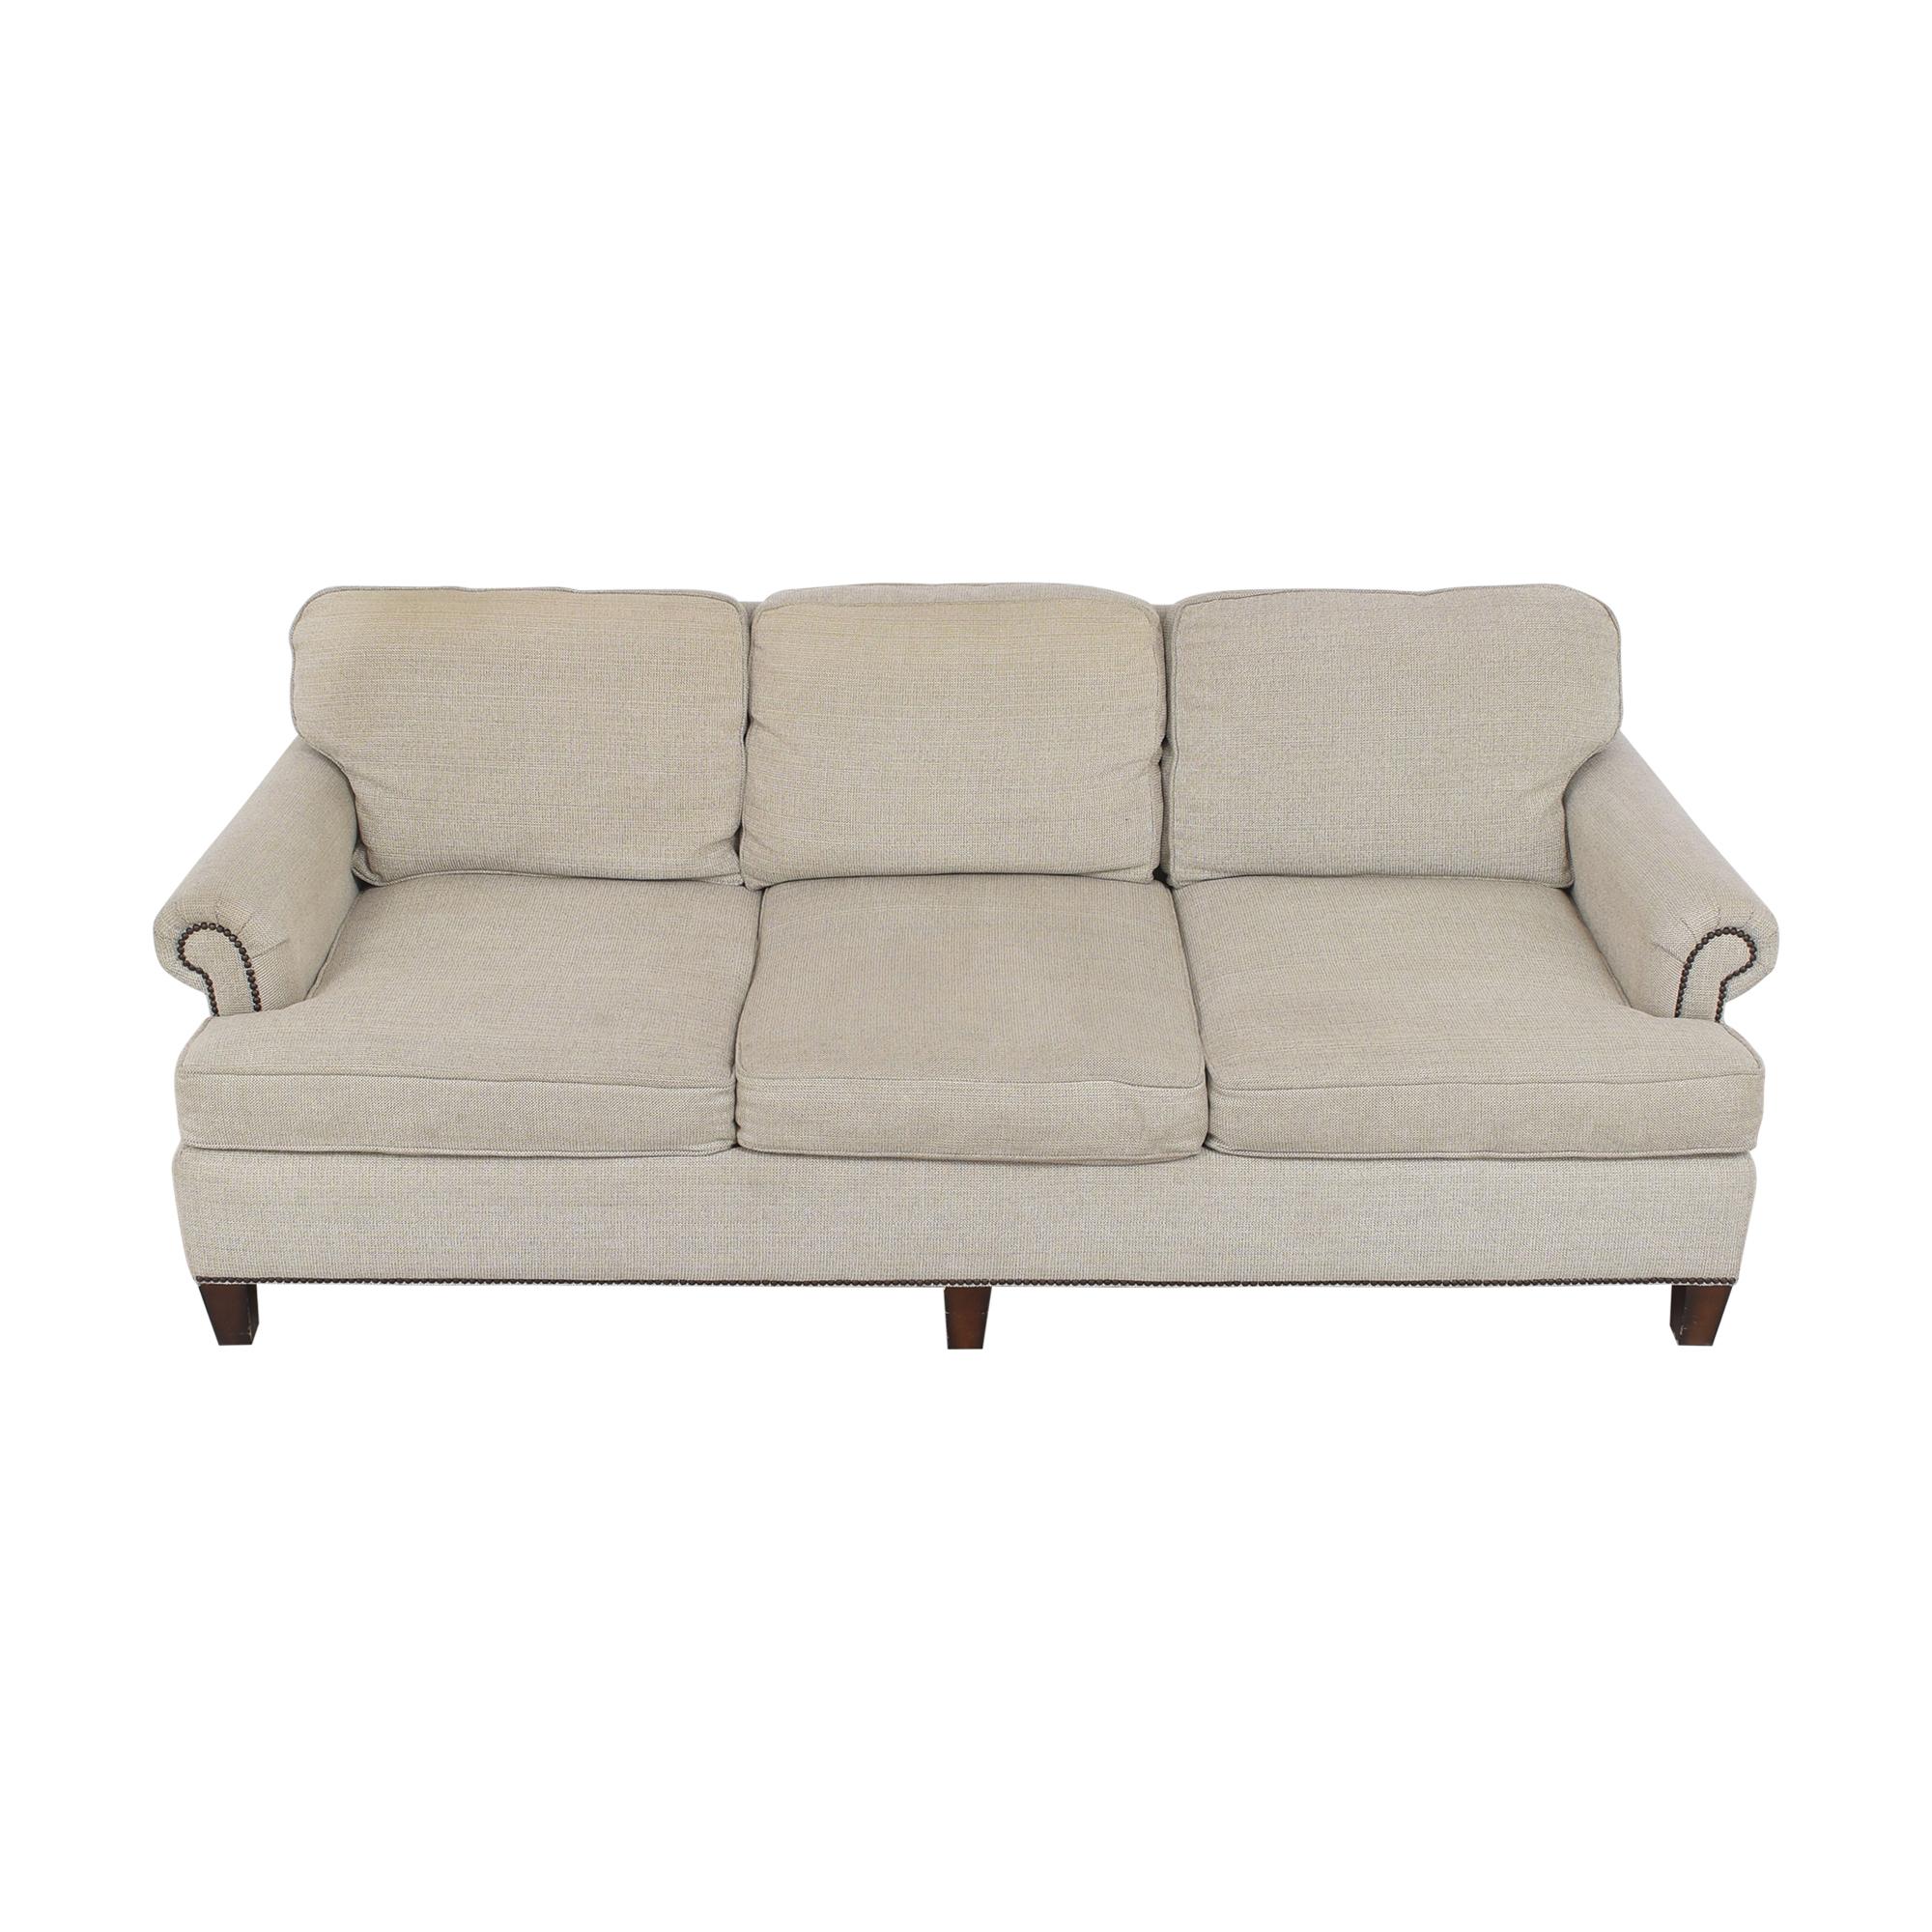 Bernhardt Bernhardt Roll Arm Nailhead Sofa Sofas